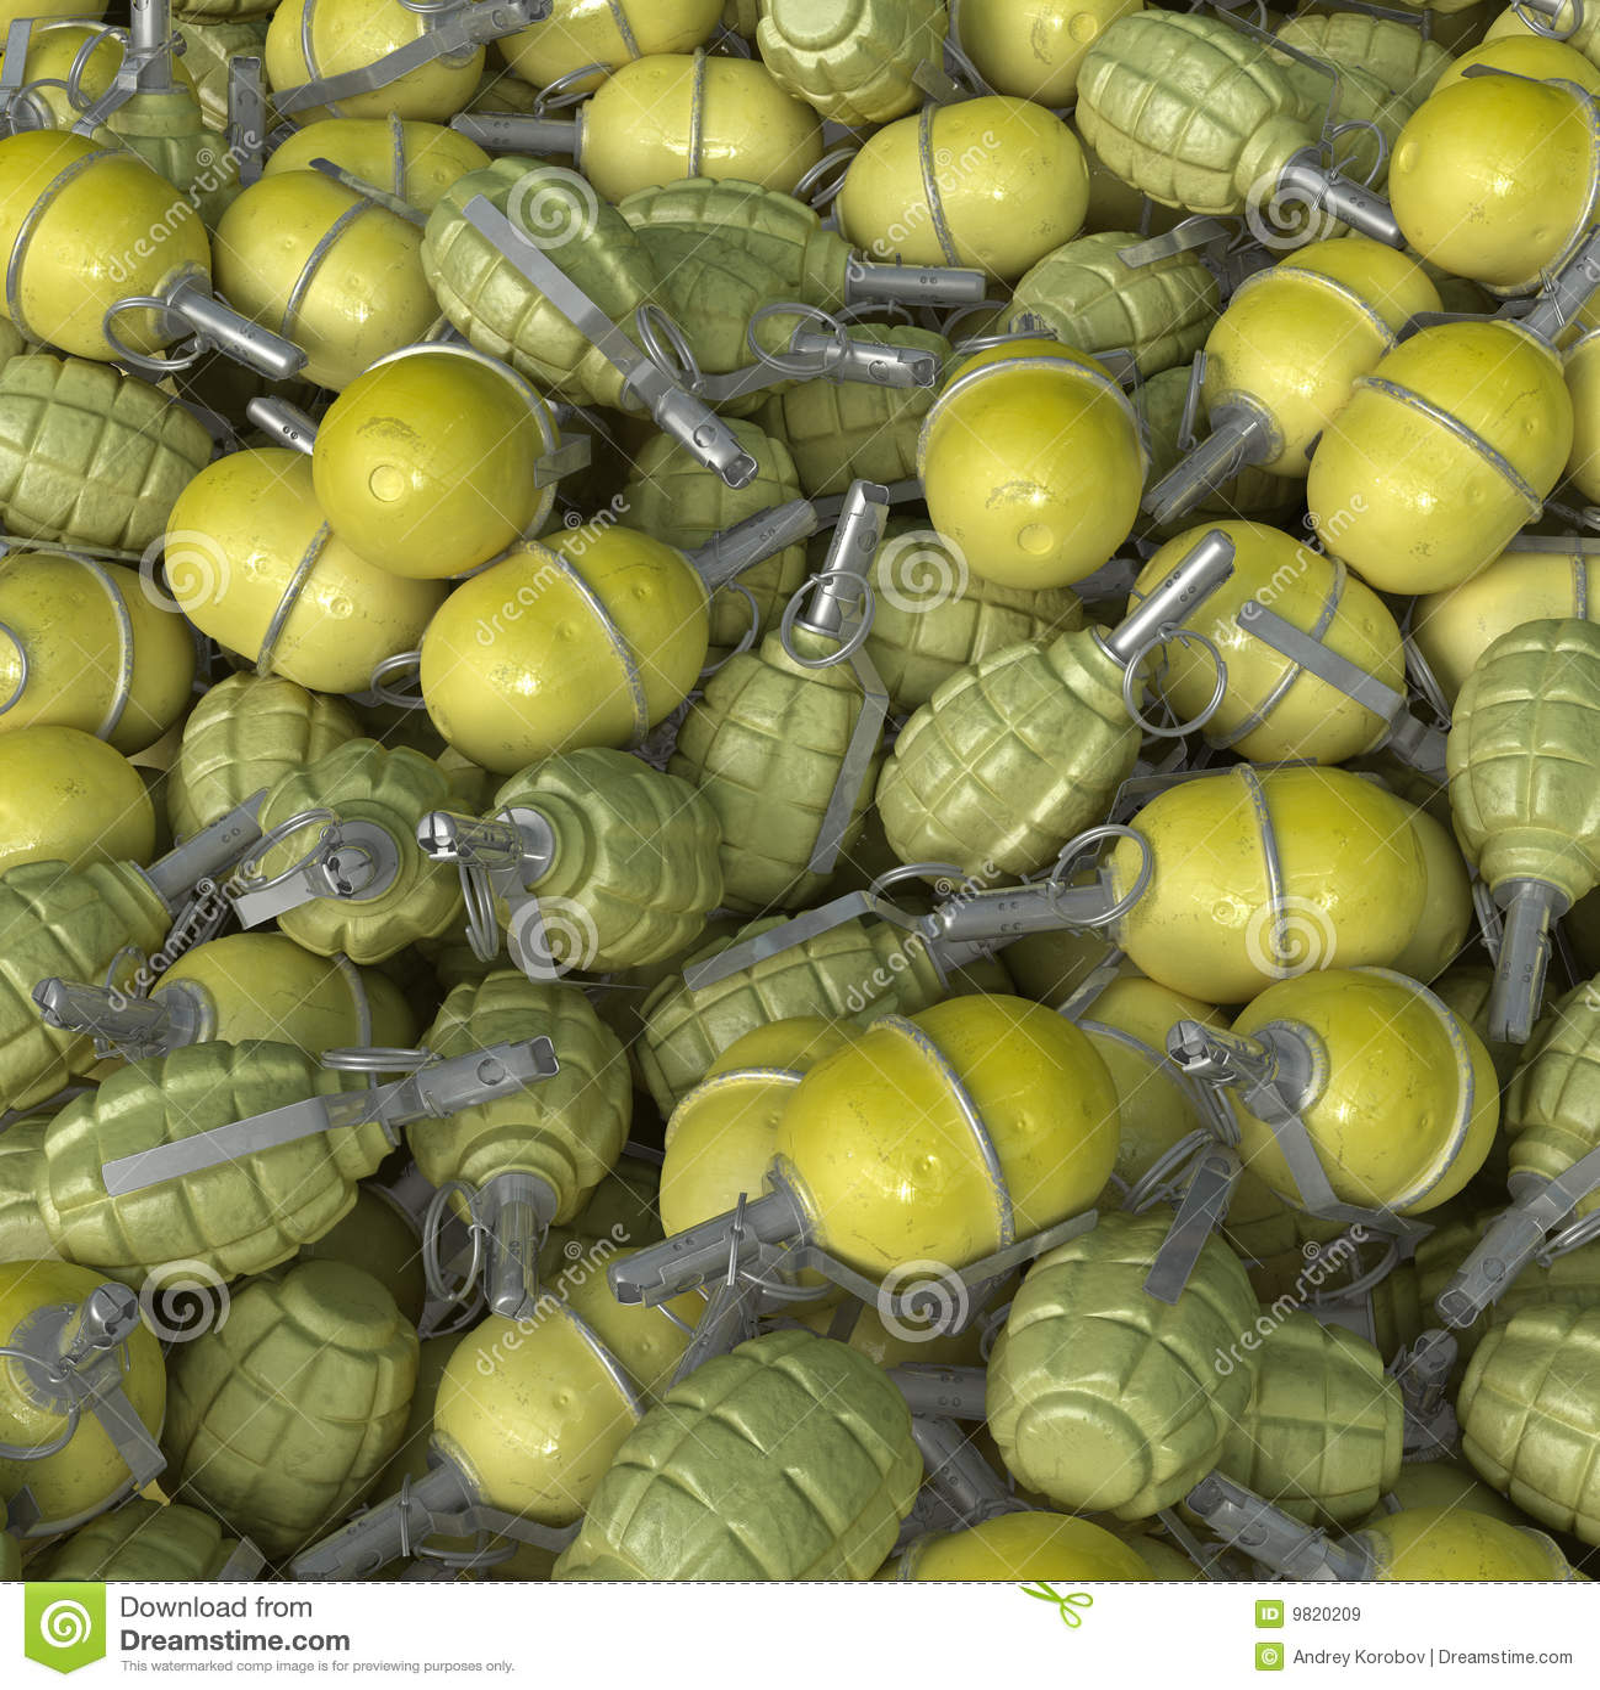 КаМАЗ с неучтенными гранатами задержан в Днепропетровской области, - Нацполиция - Цензор.НЕТ 6611